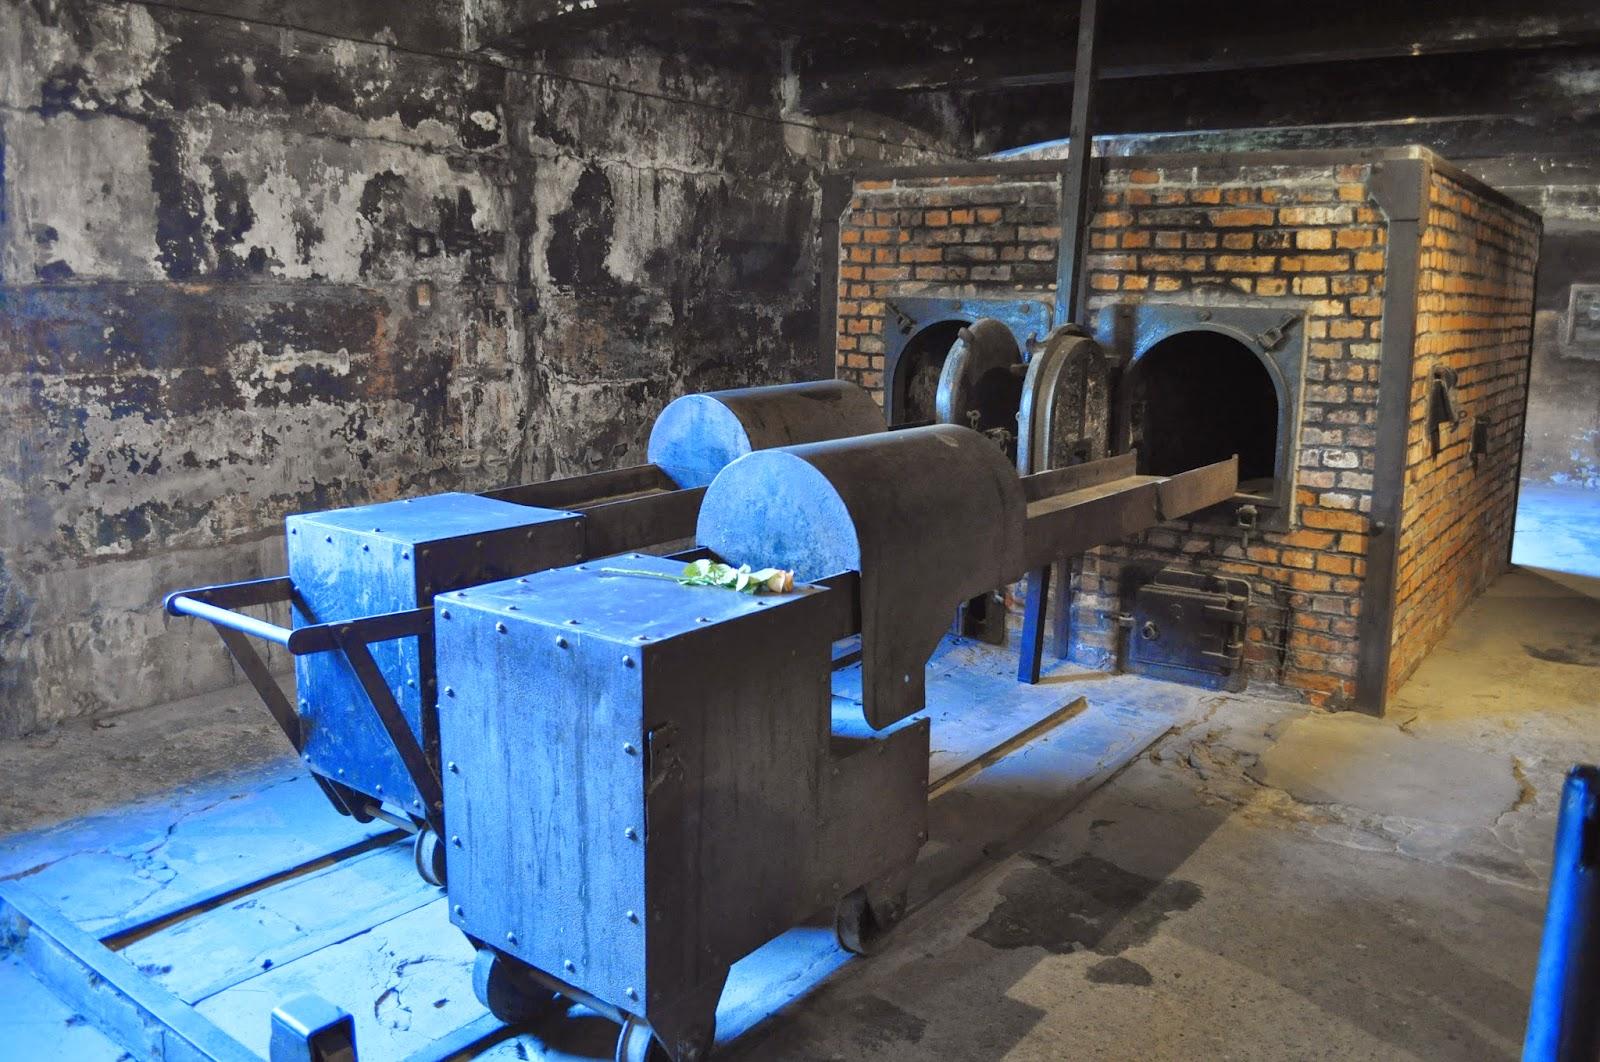 Rondelles et sacoches: Auschwitz, une visite marquante